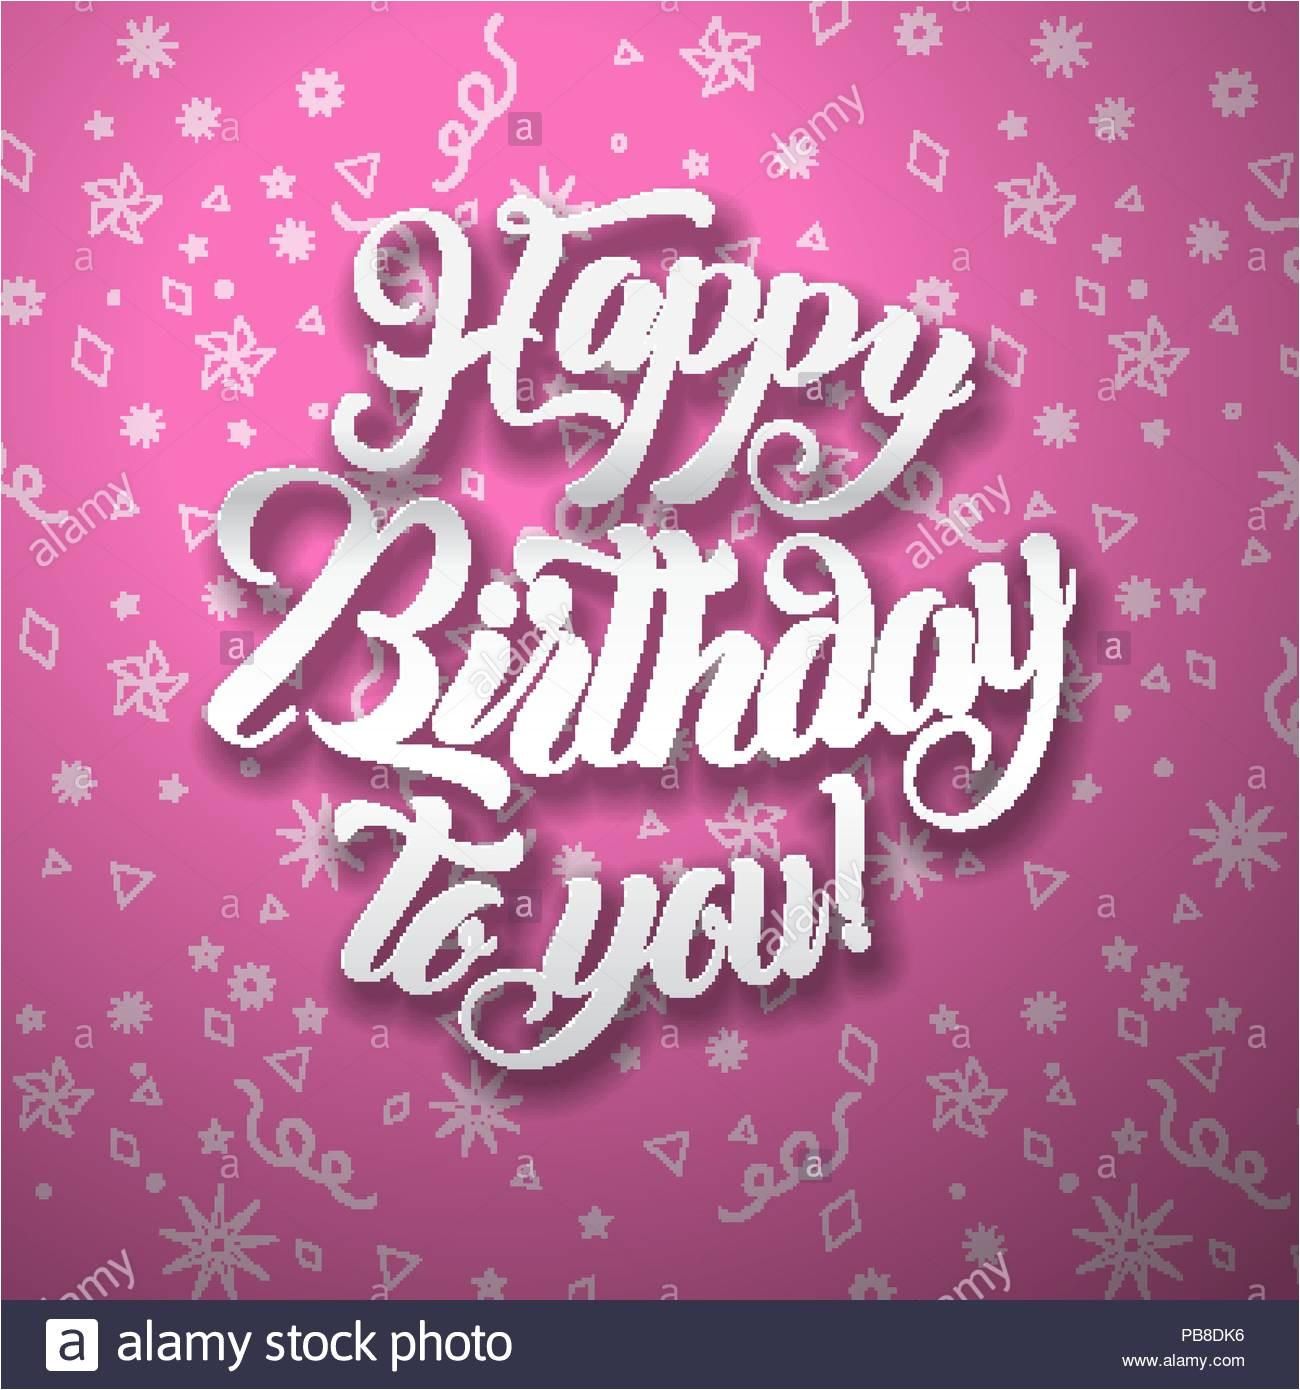 happy birthday to you lettering text vector illustration birthday greeting card design pb8dk6 jpg